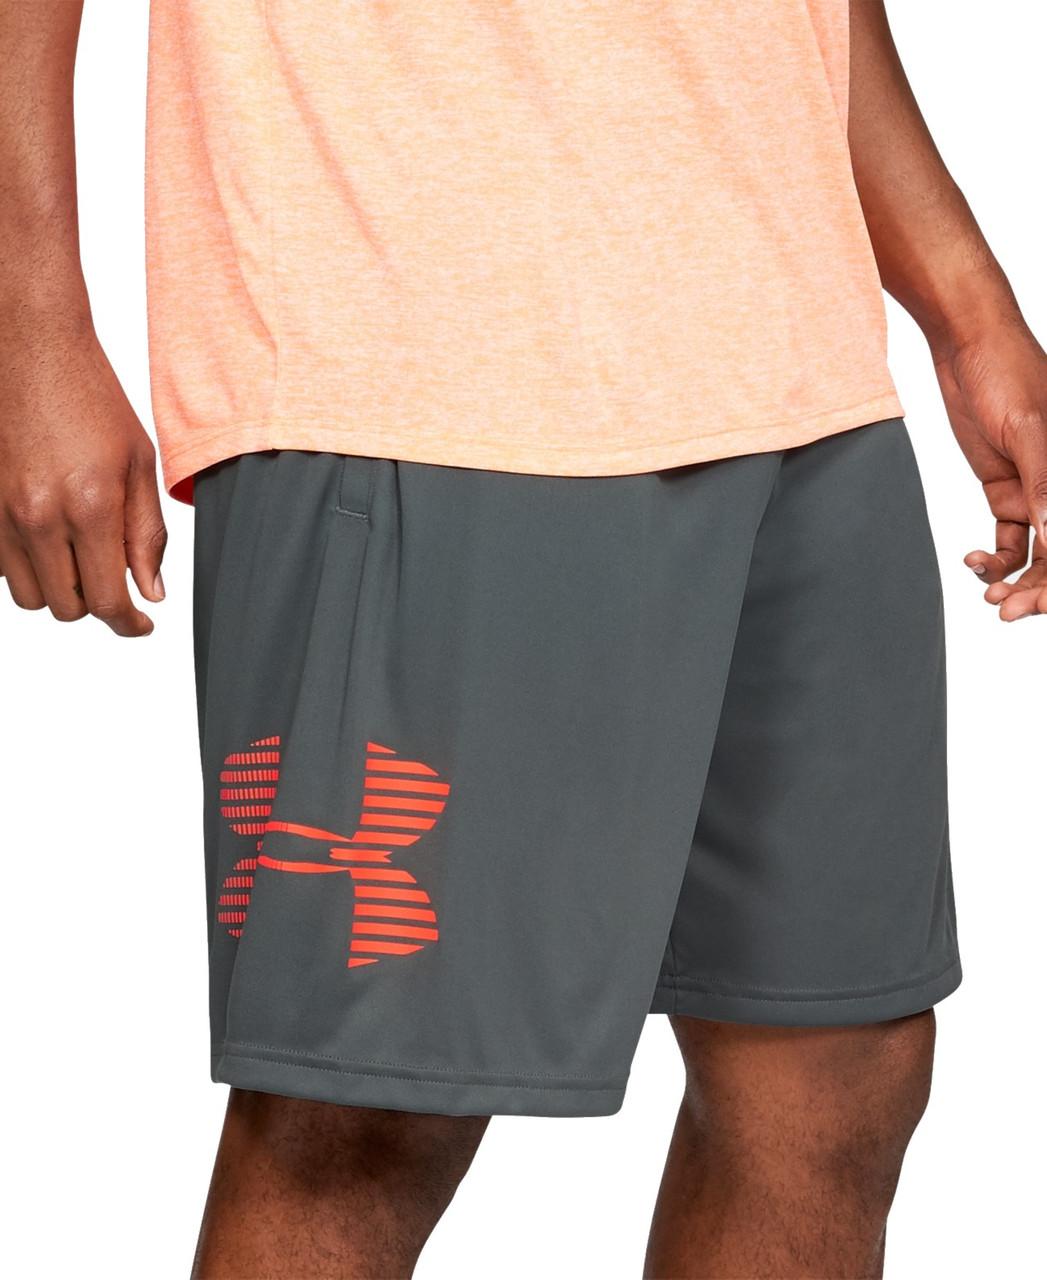 Under Armour Activewear Bottoms Мужские шорты-Т1